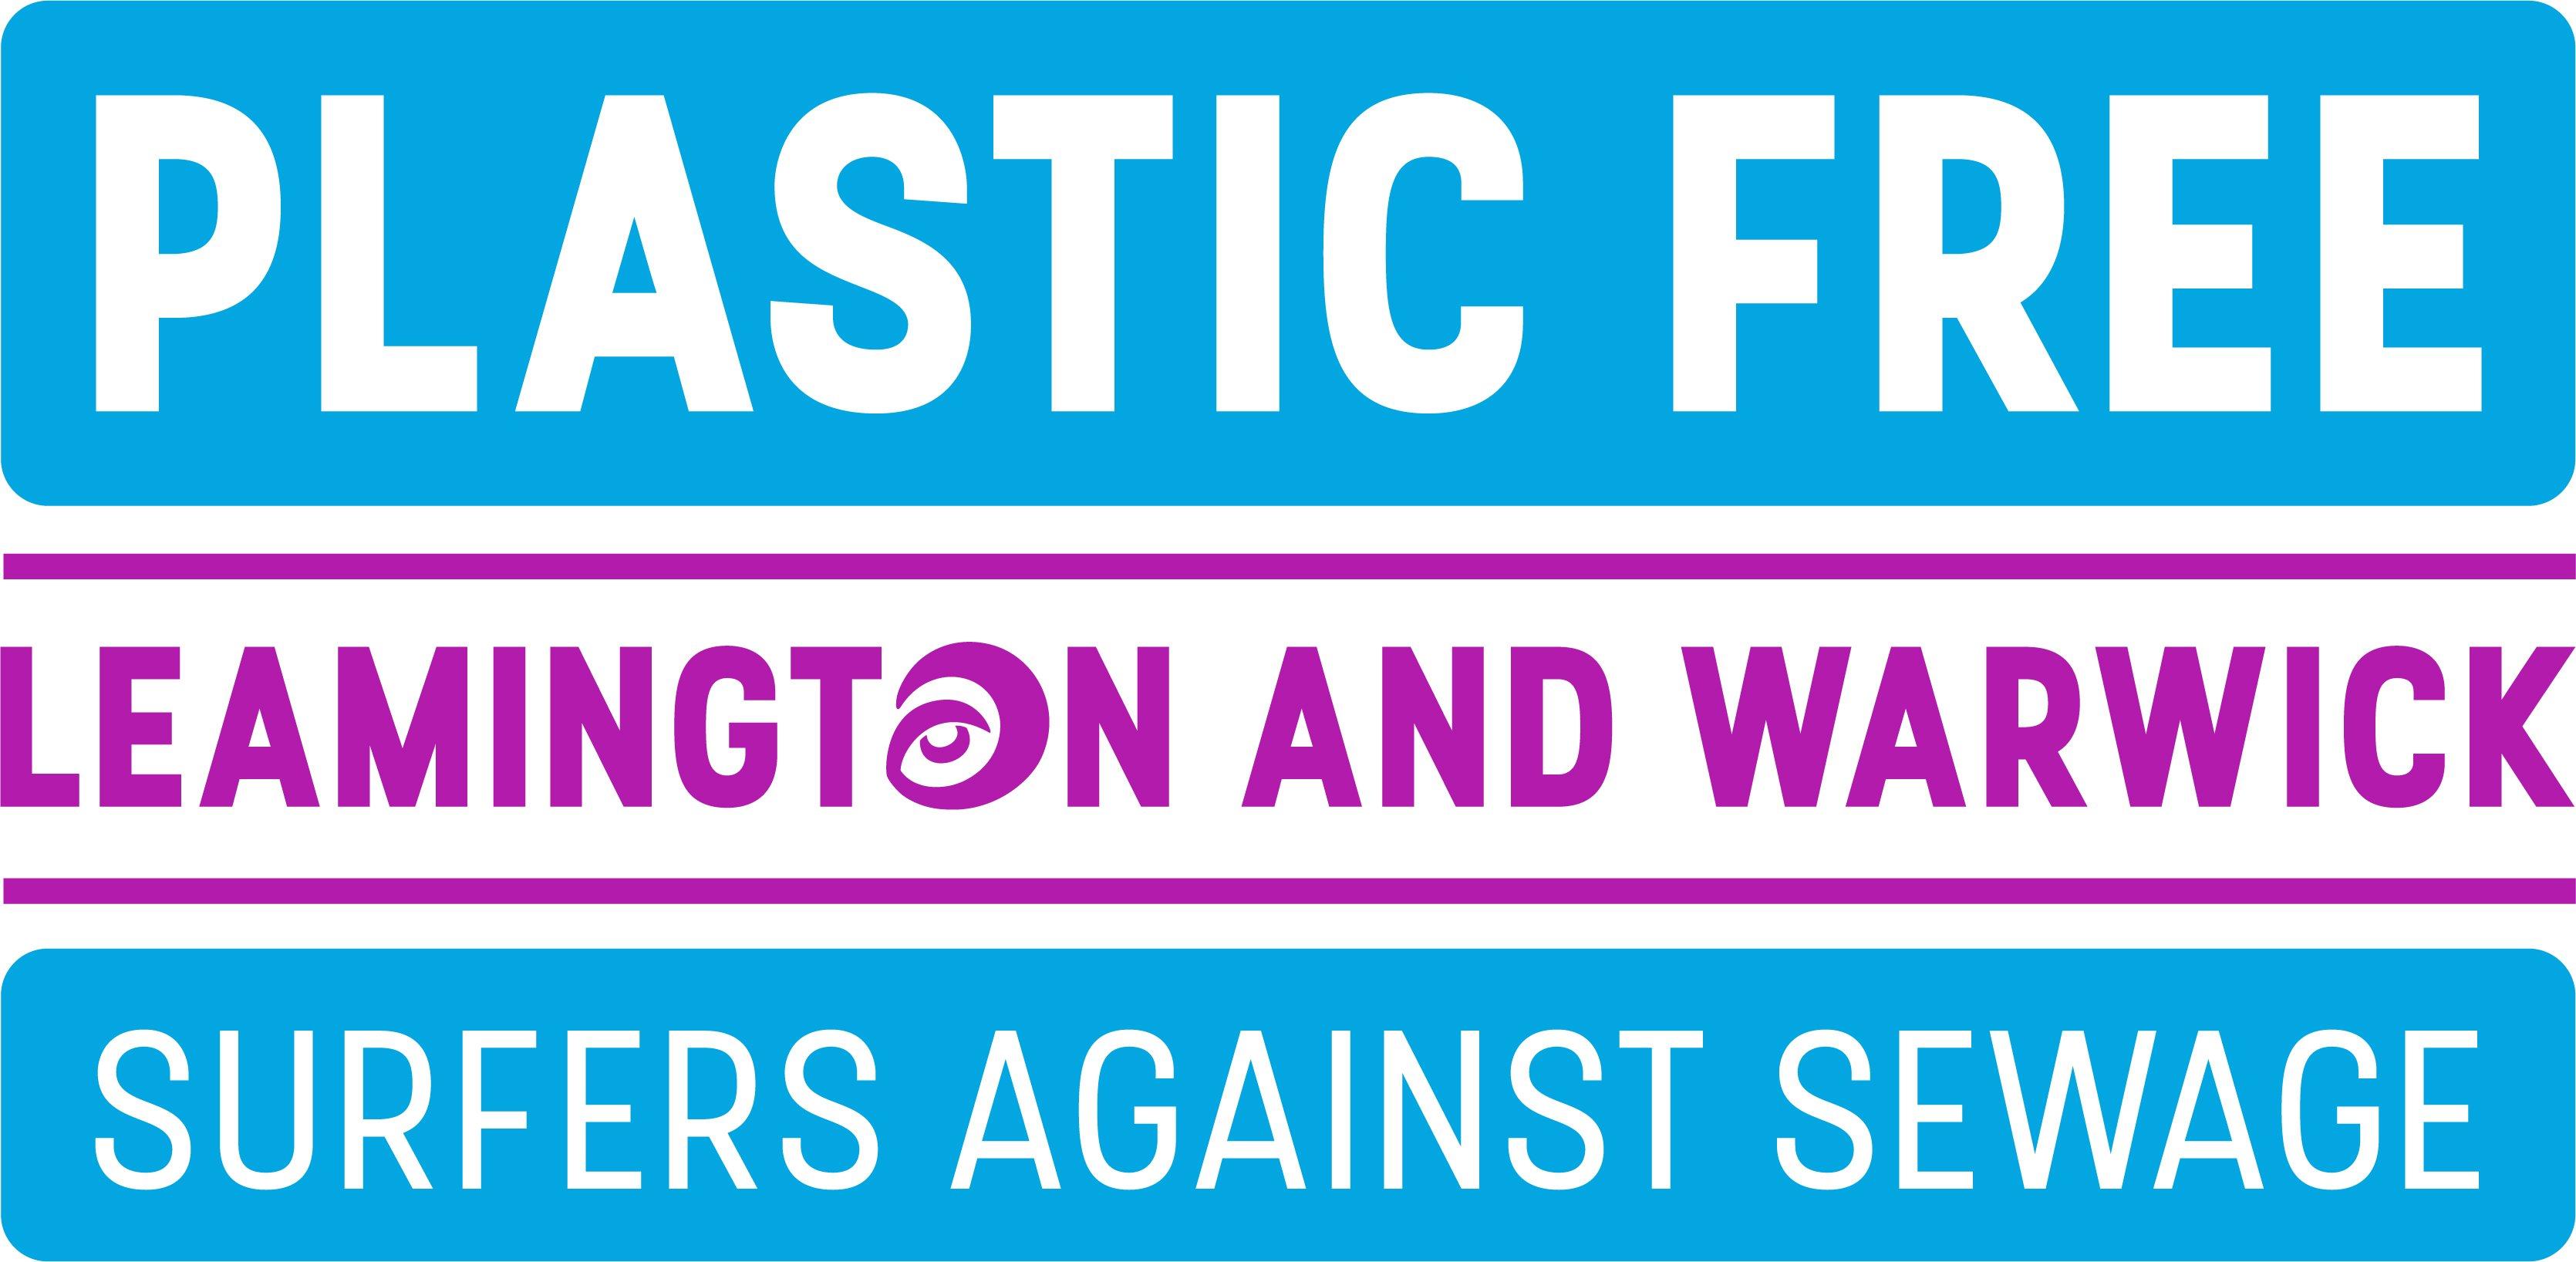 Plastic free status logo